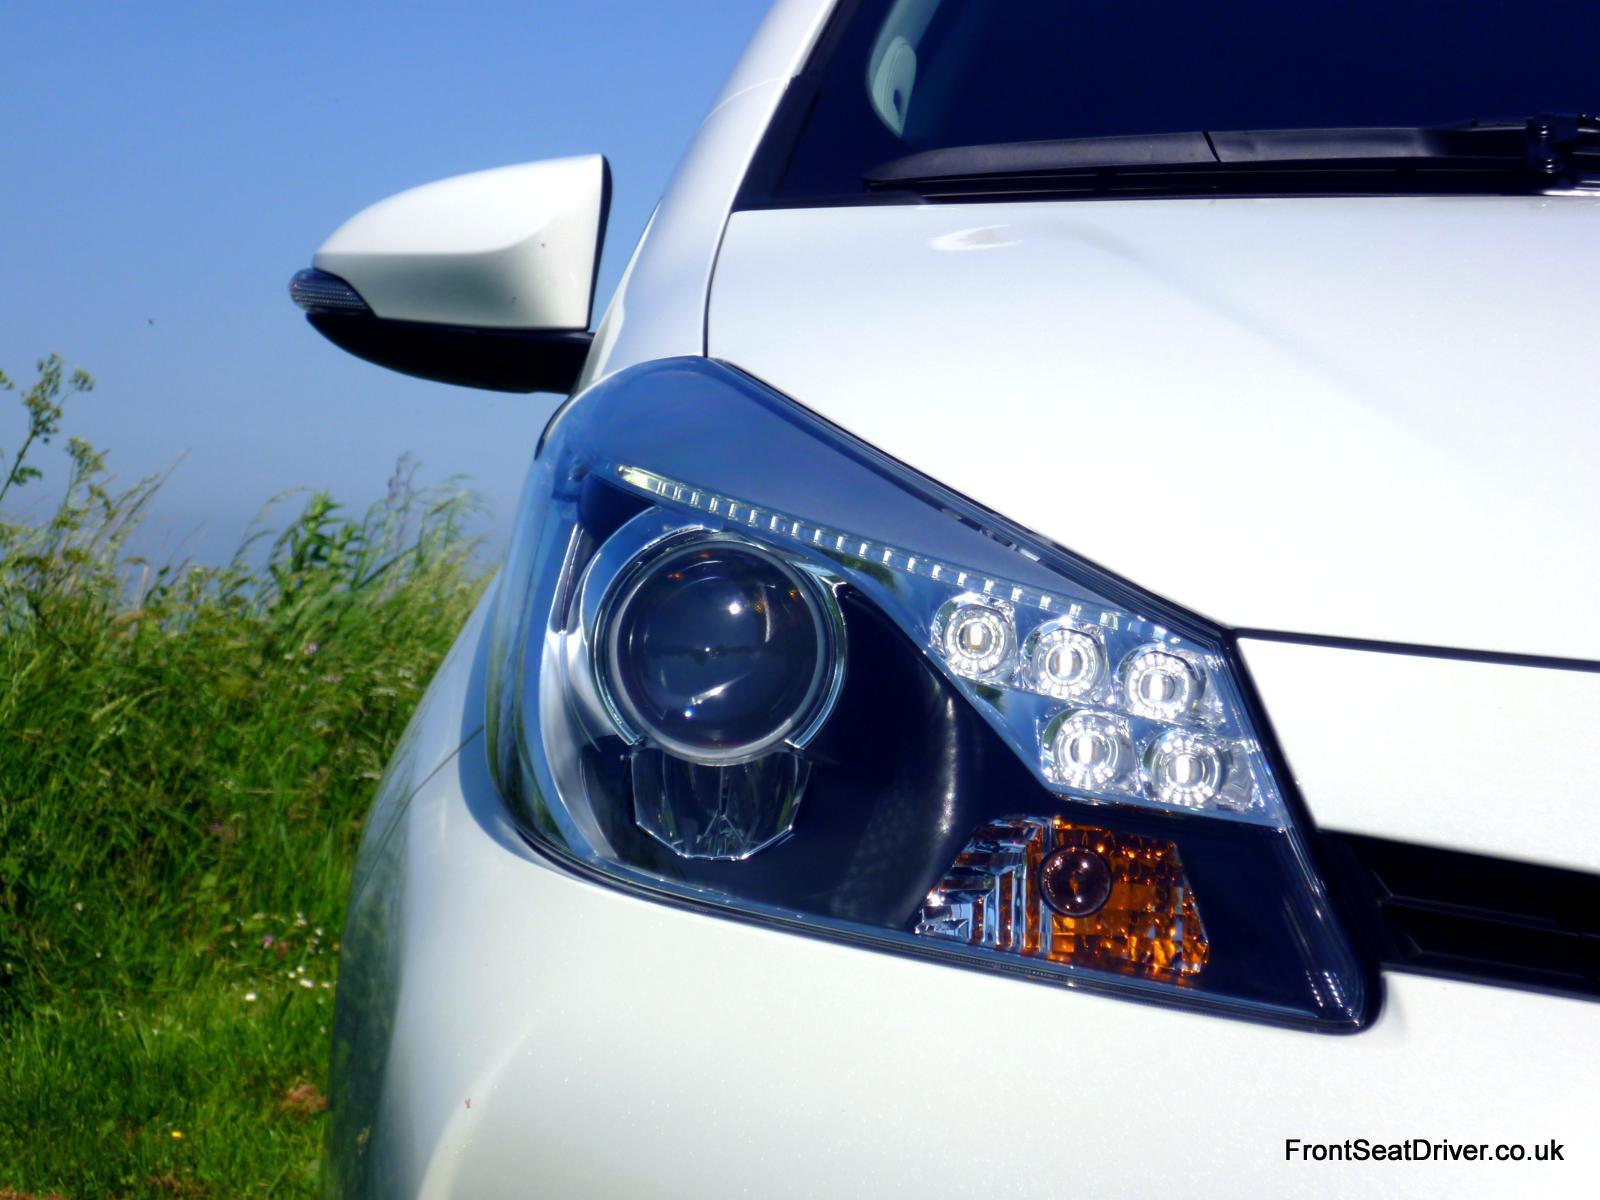 Toyota Yaris Hybrid 2012 Keen Look Headlights Front Seat